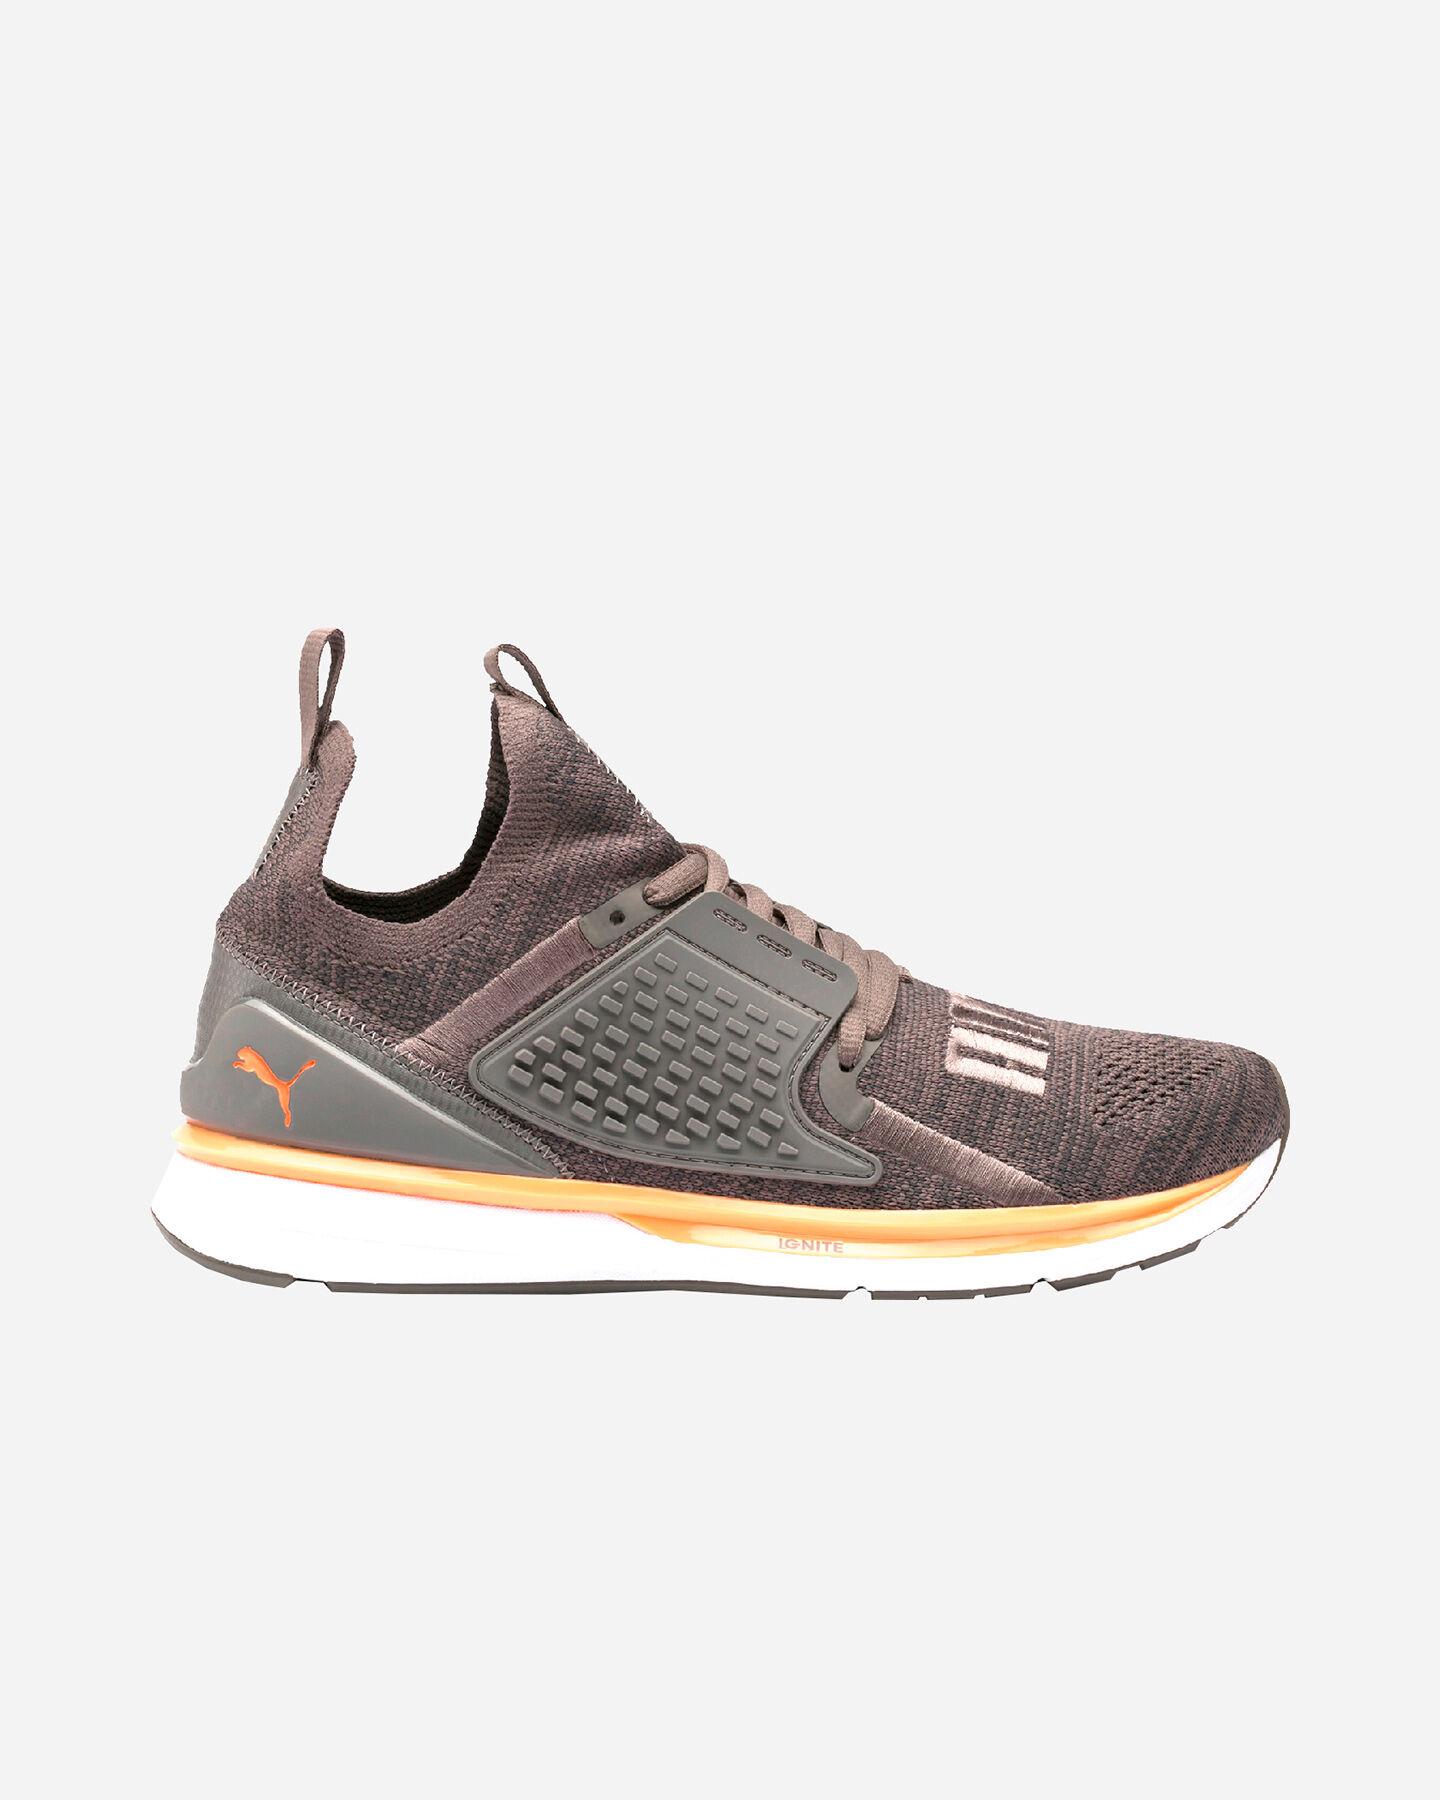 Scarpe Sneakers Puma Ignite Limitless 2 Evoknit M 19144107